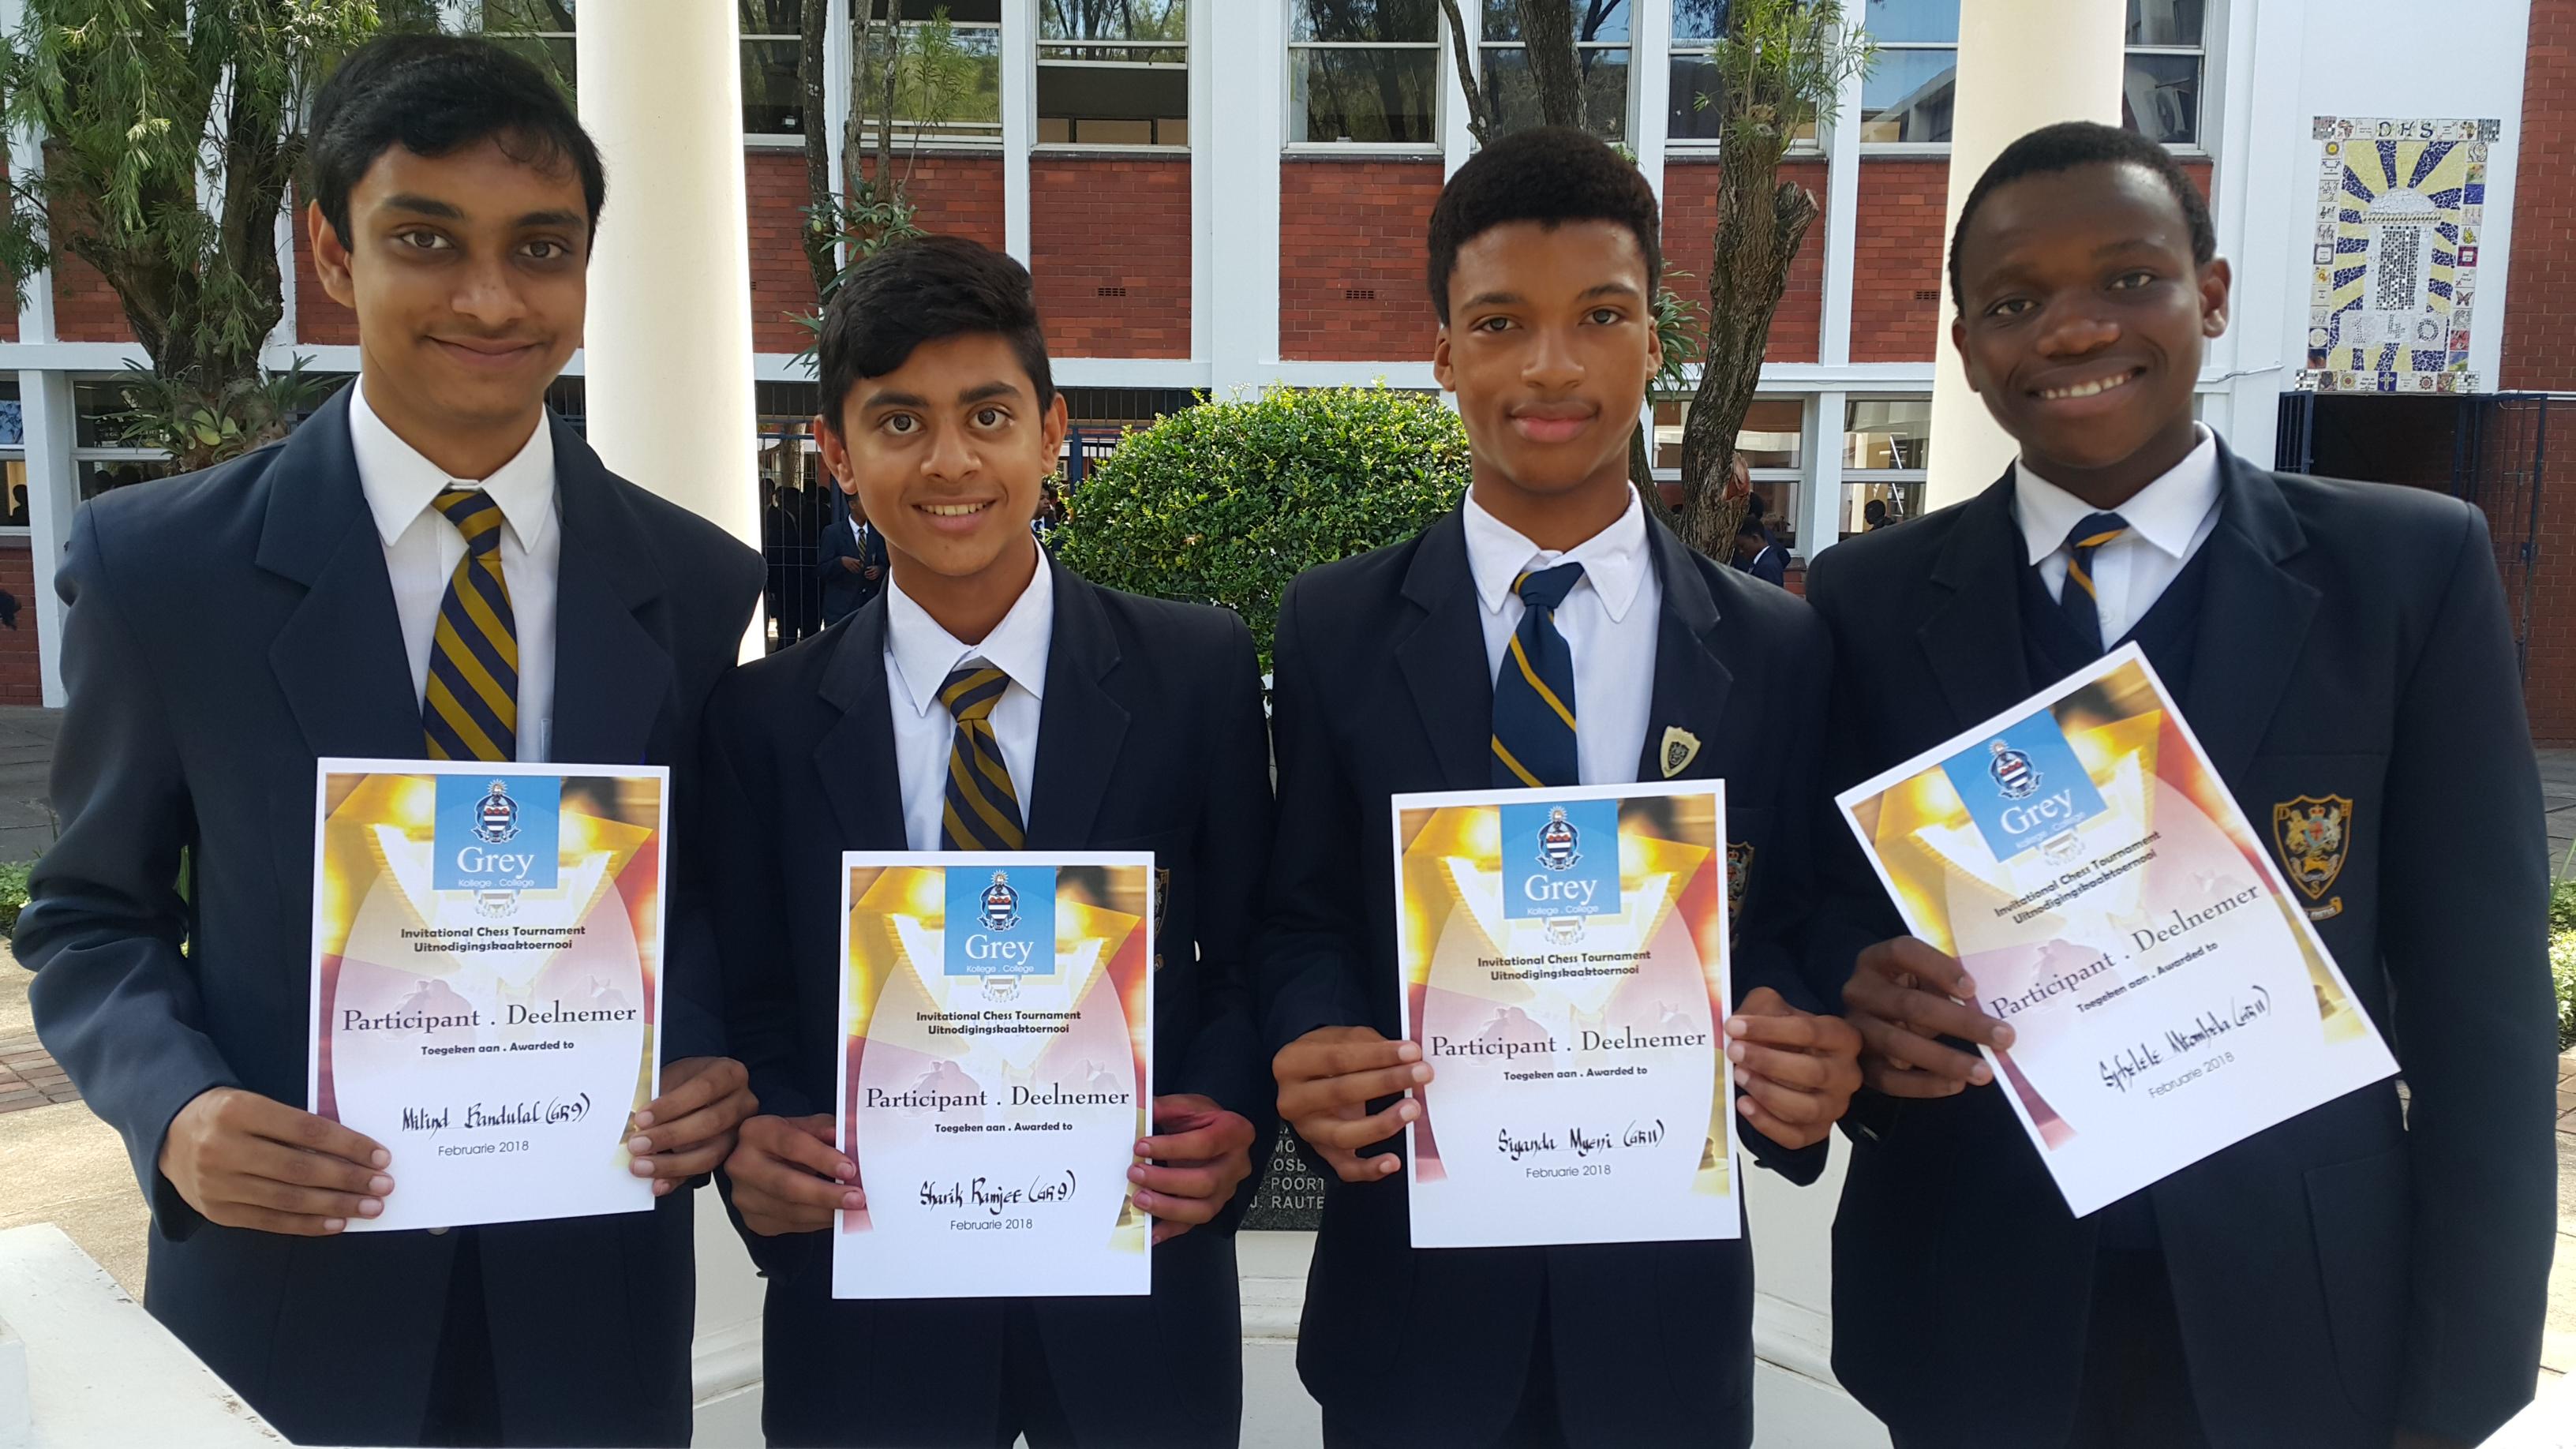 The DHS C Team, Milind Bandulal, Sharik Ramjee, Siyanda Myeni, and Sphelele Mtombela placed 8th in the B Section